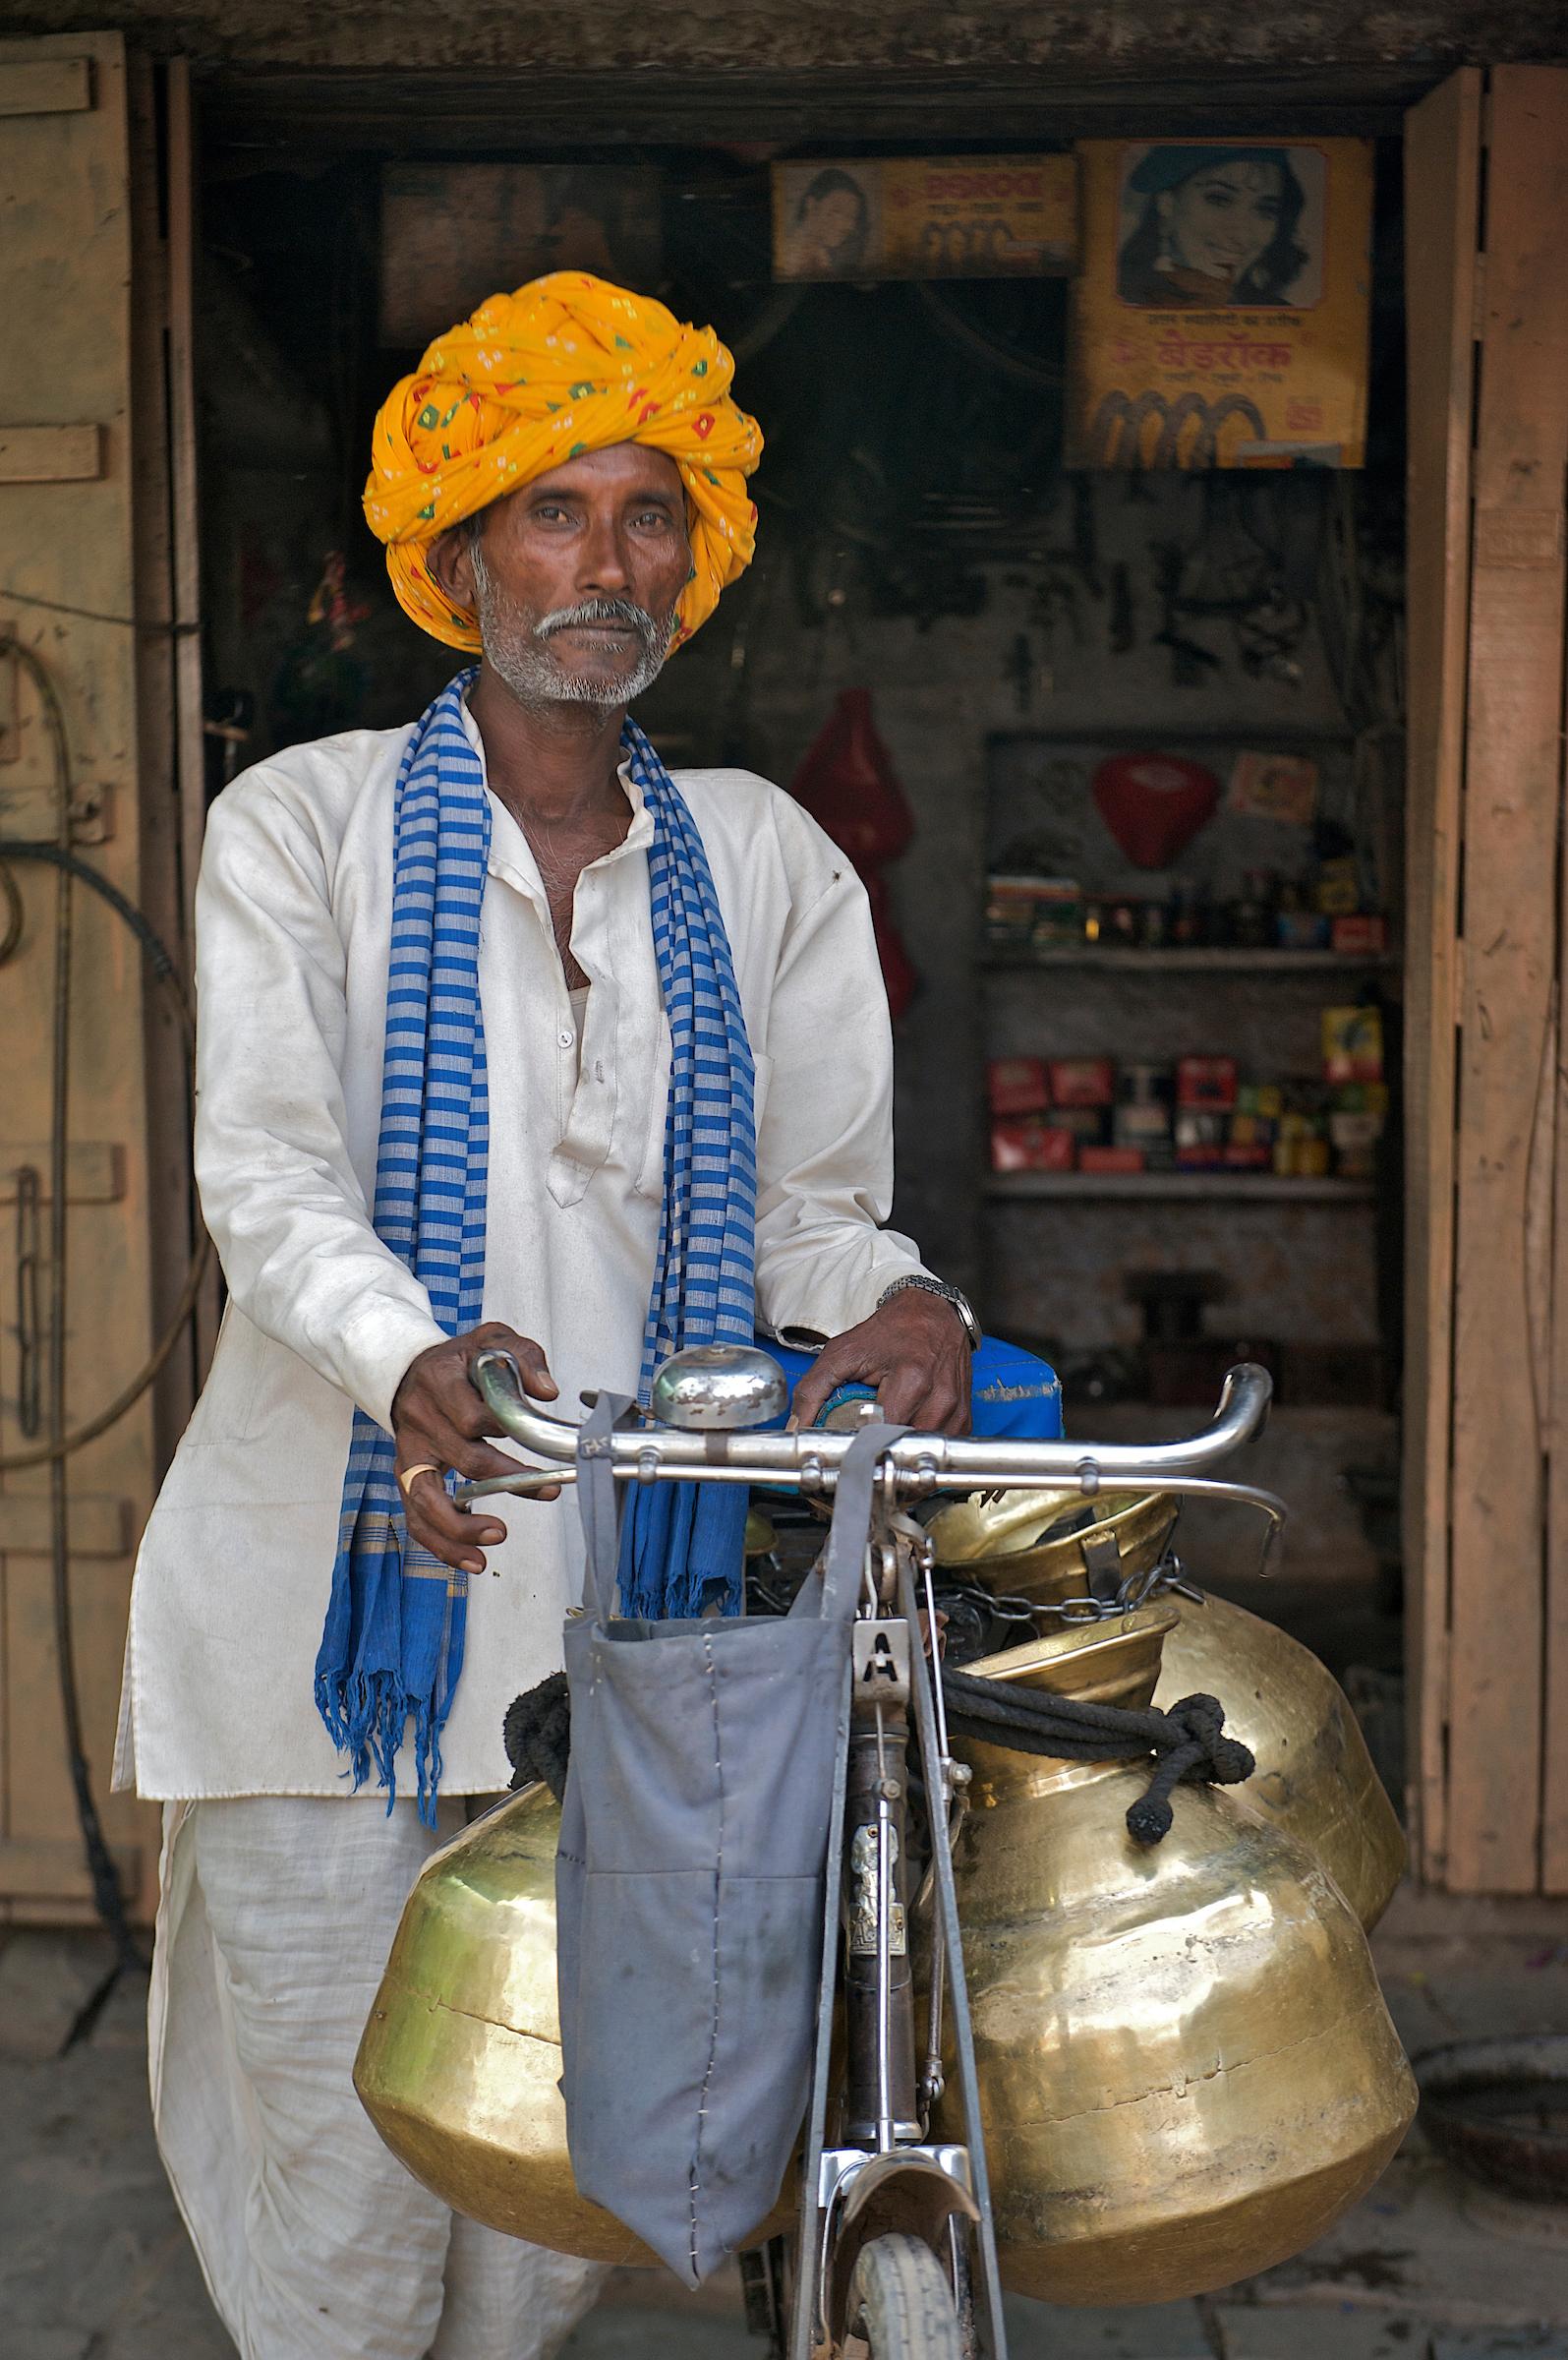 Rural Milkman - Jait Sagar, India